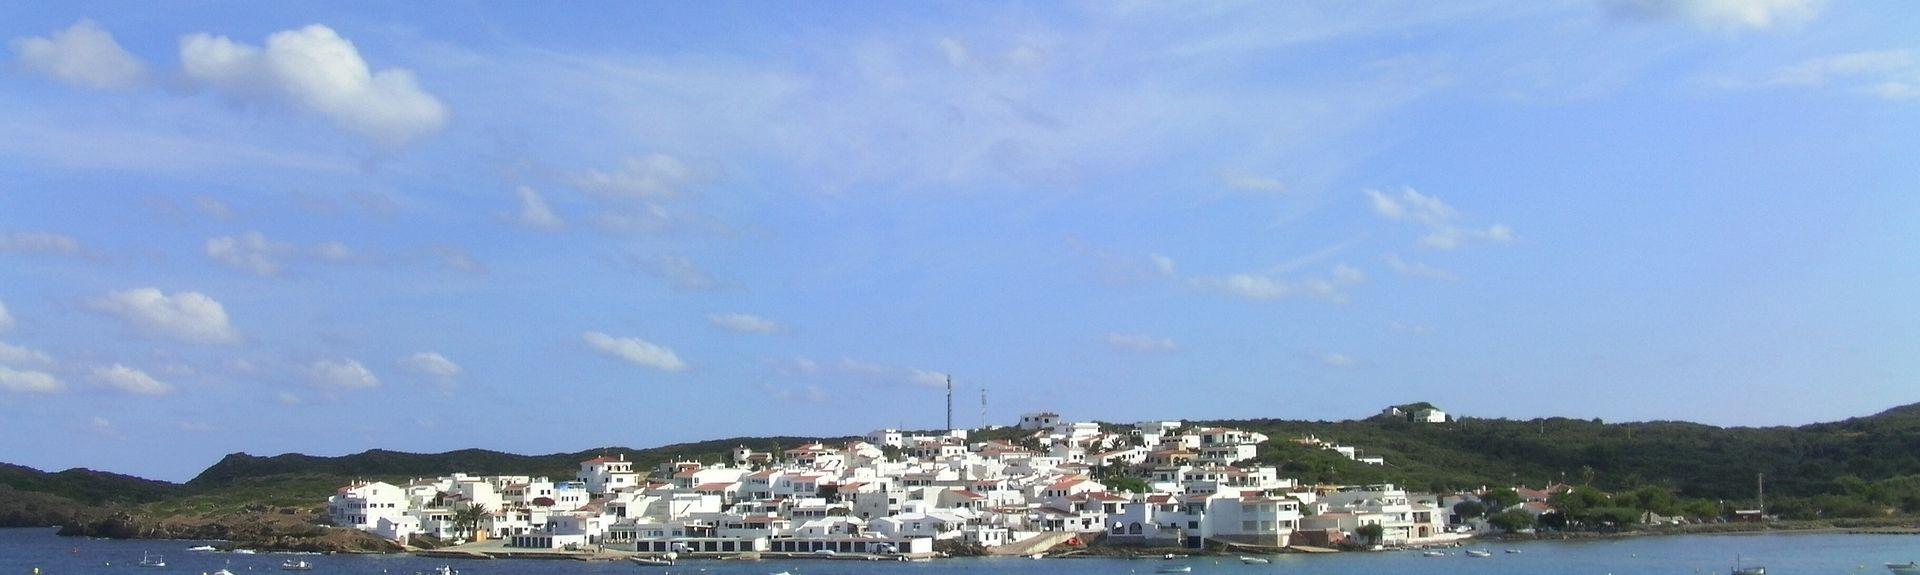 Sant Antoni, Balearic Islands, Spain